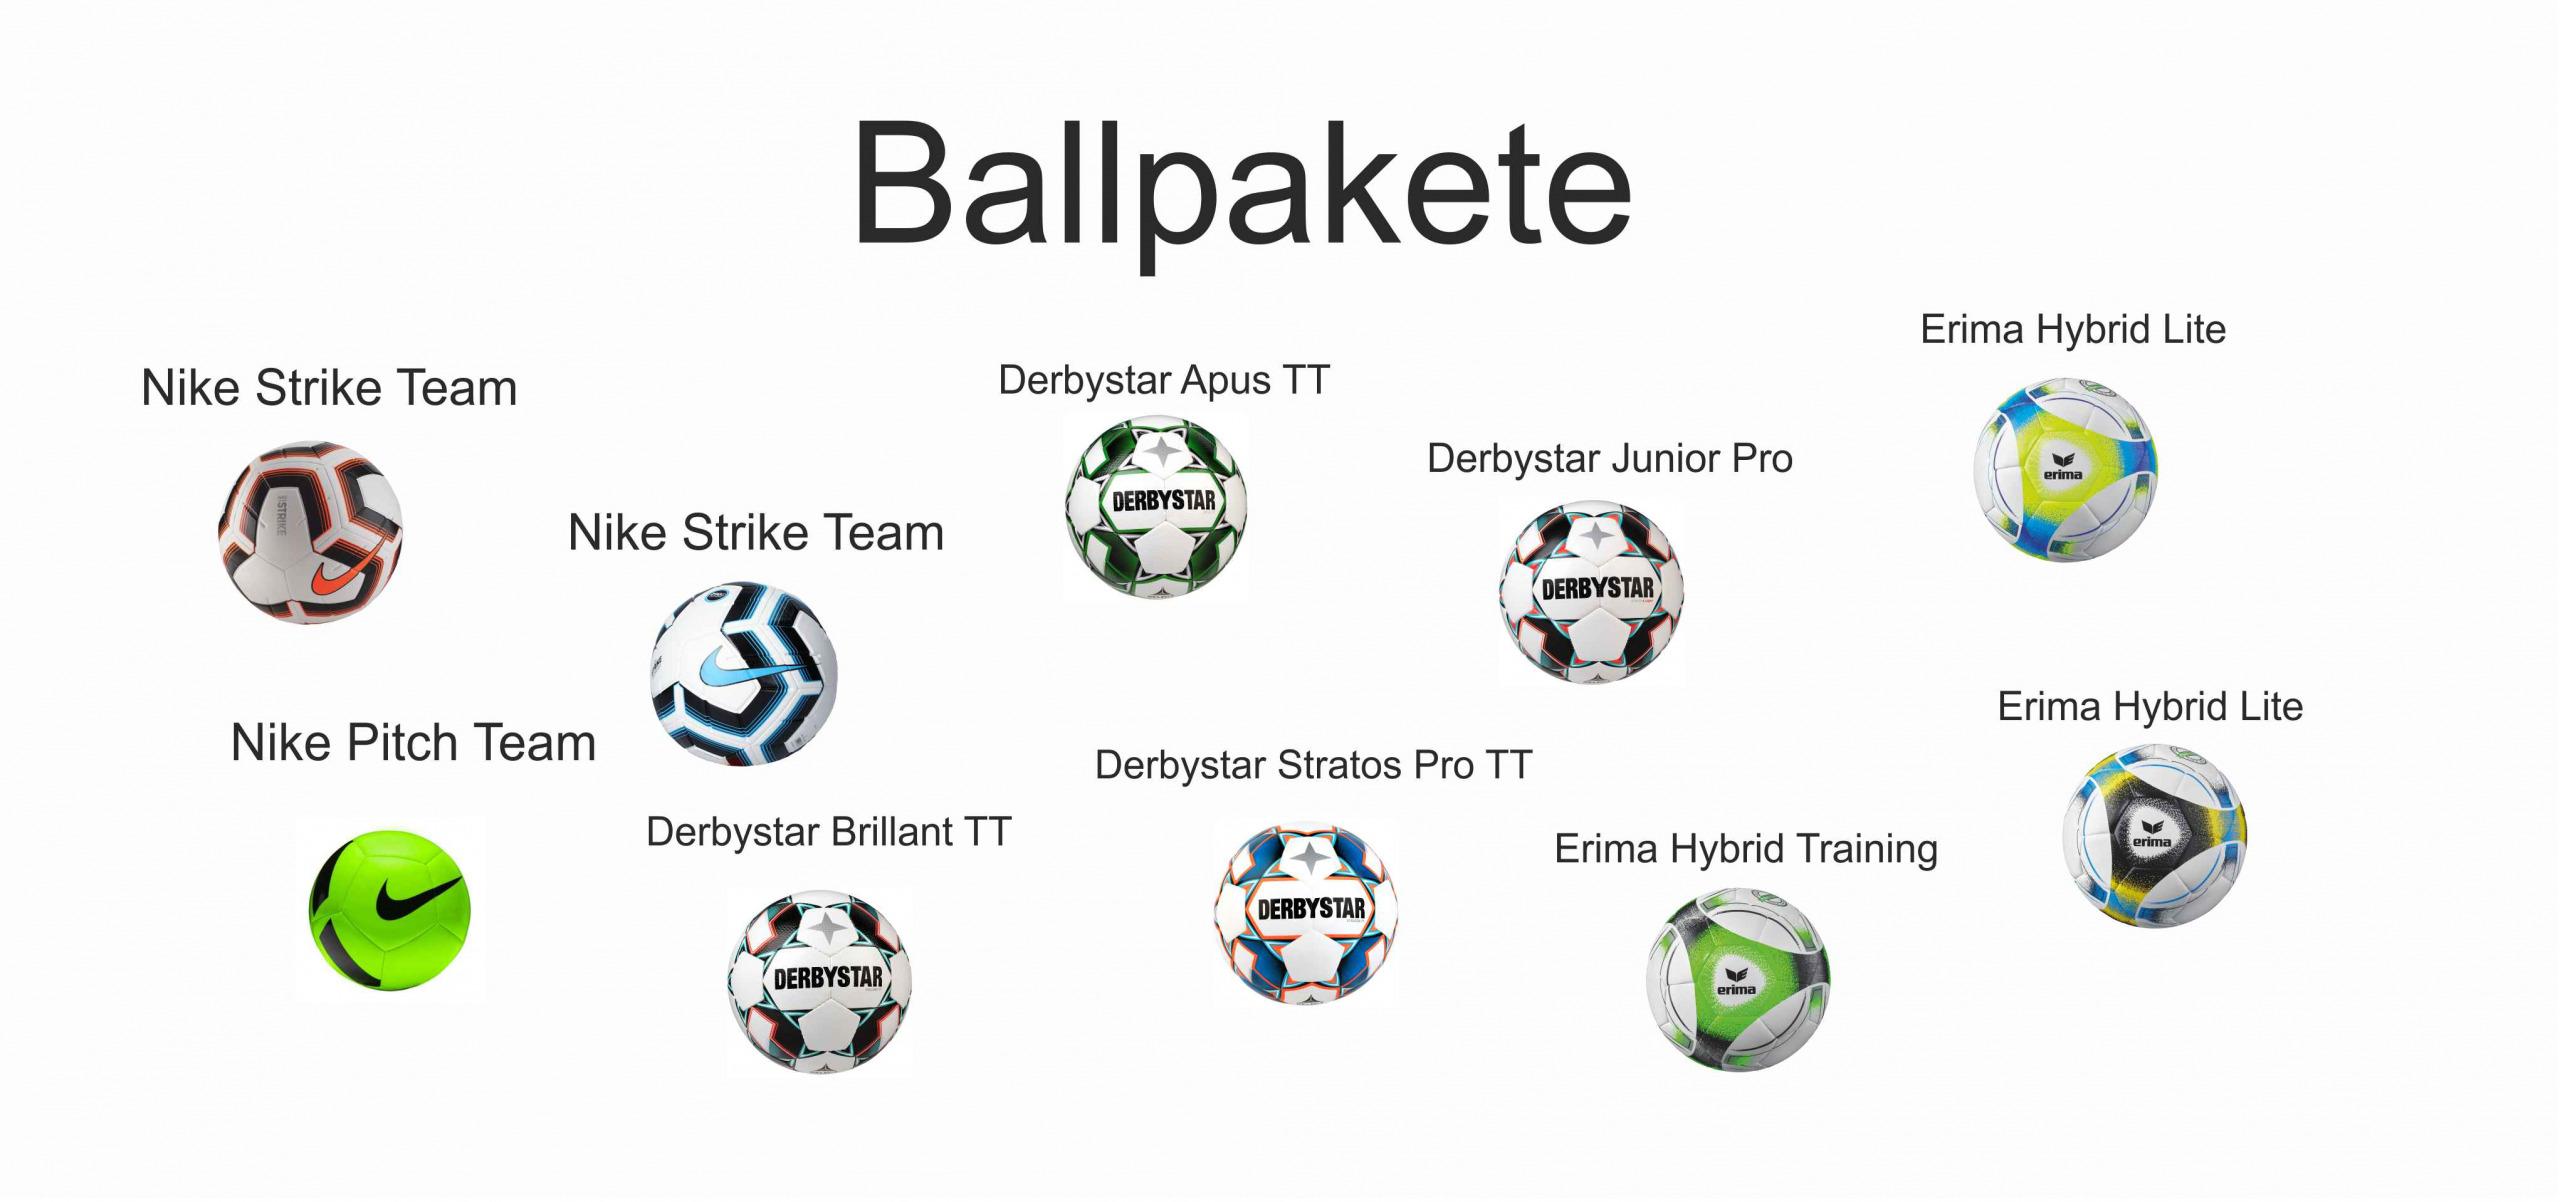 Ballpakete